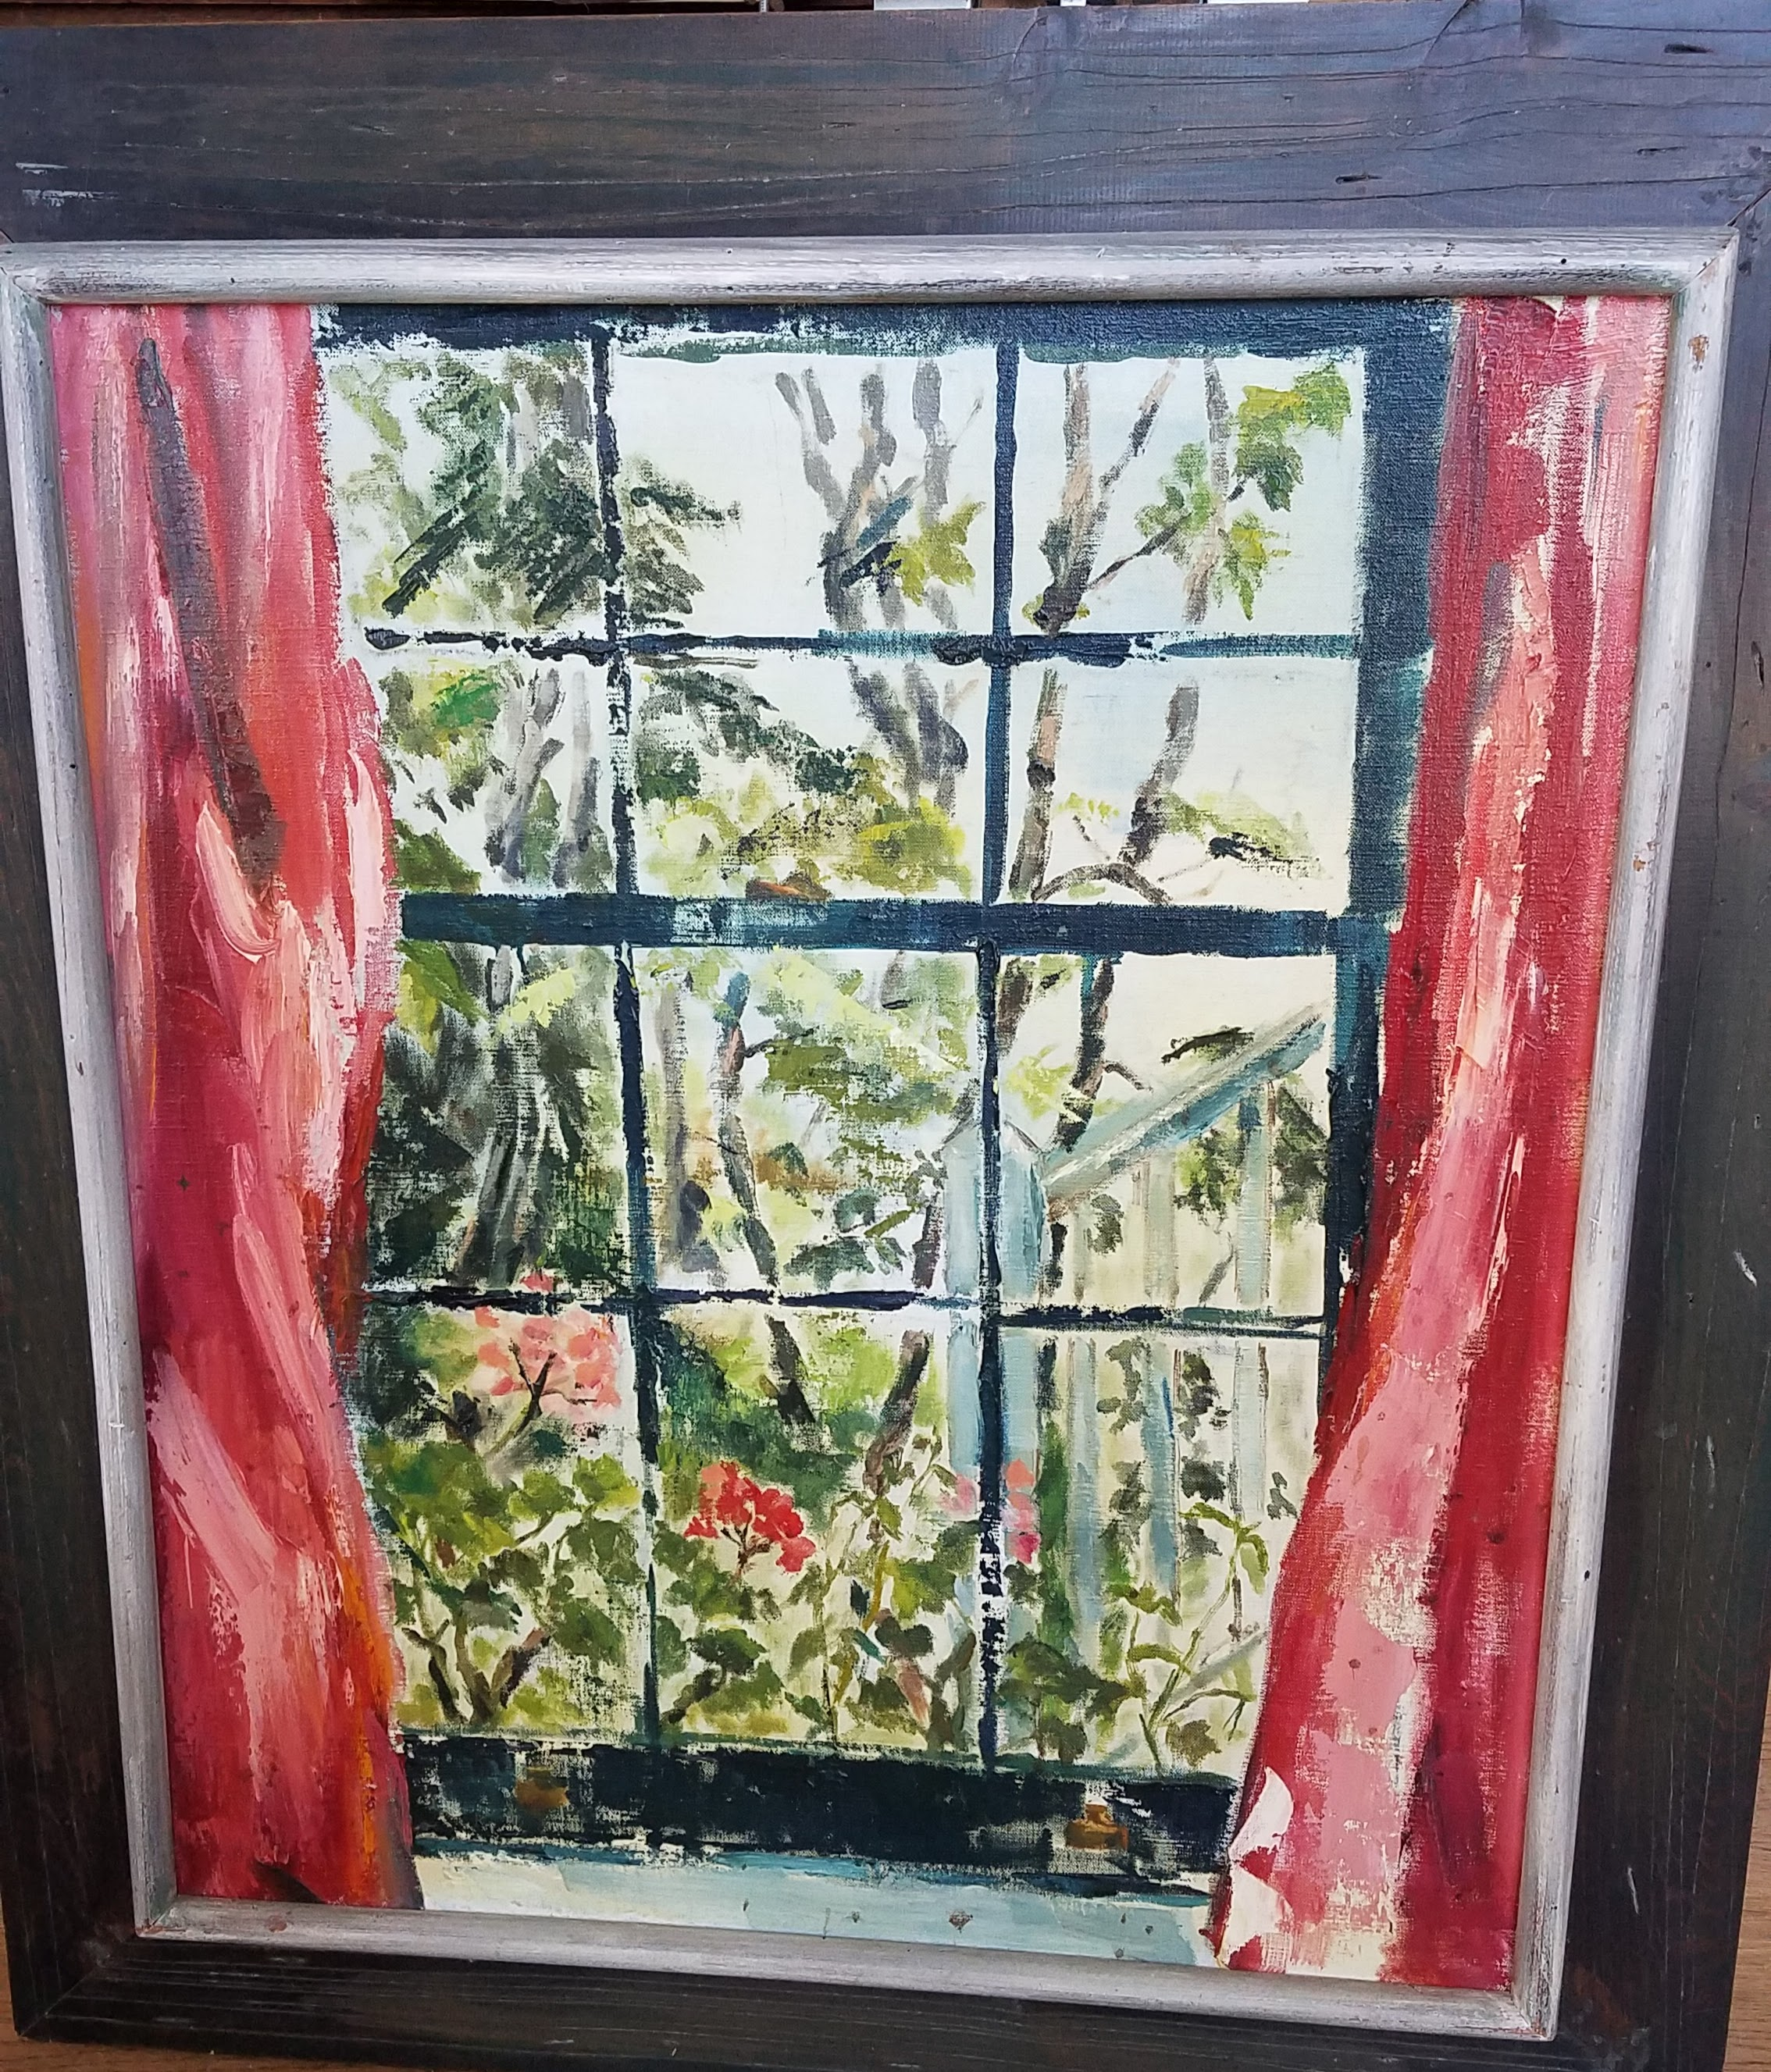 46) Window View